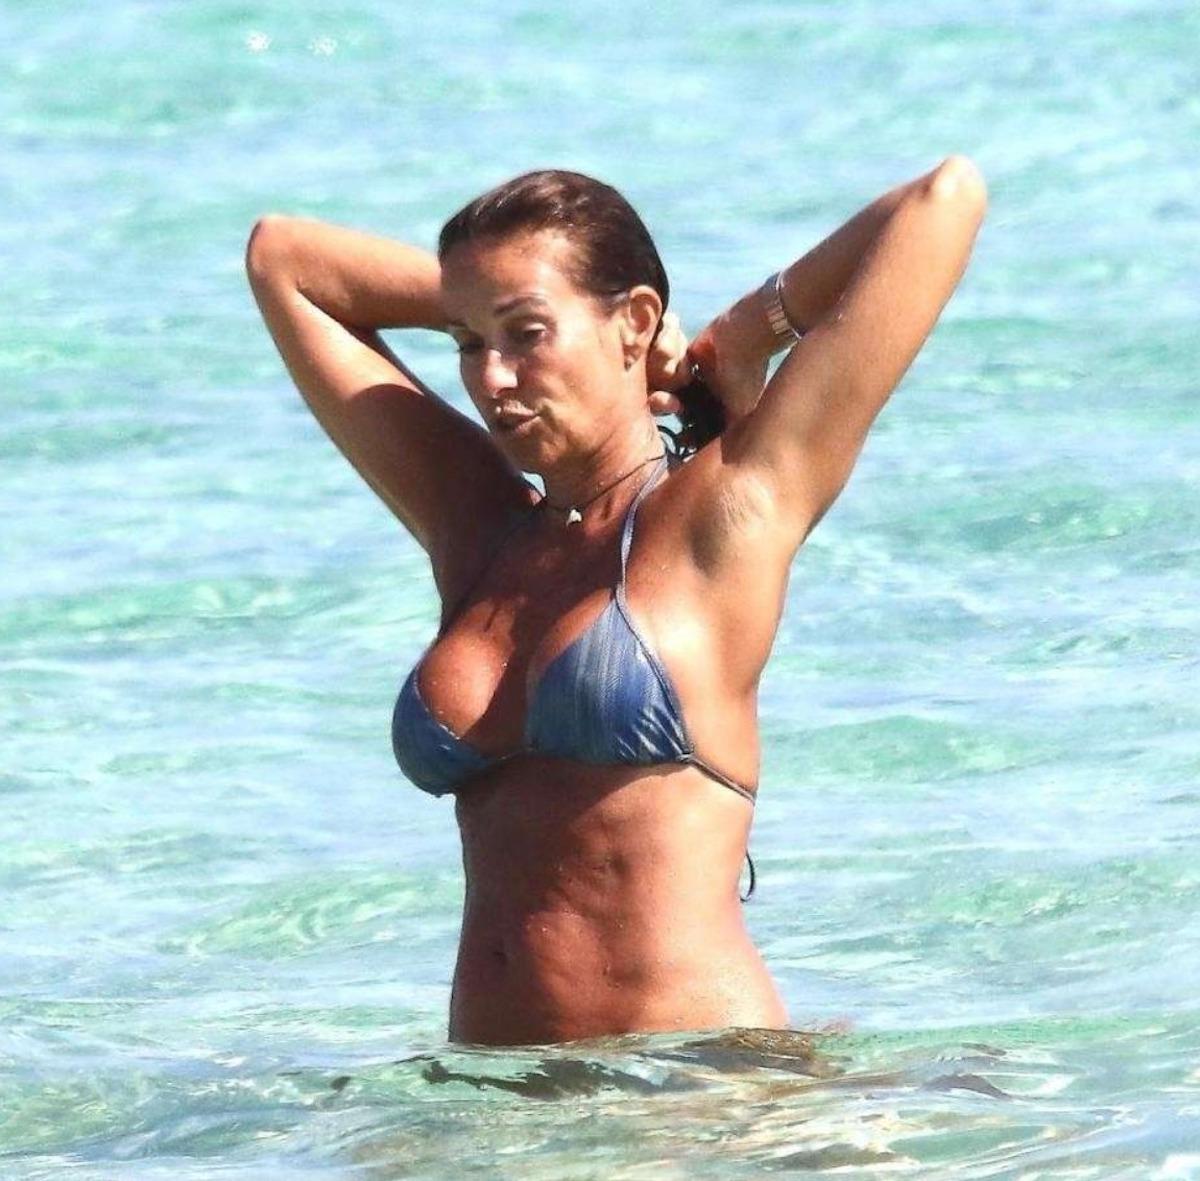 cristina parodi fisico bikini foto benedetta parodi